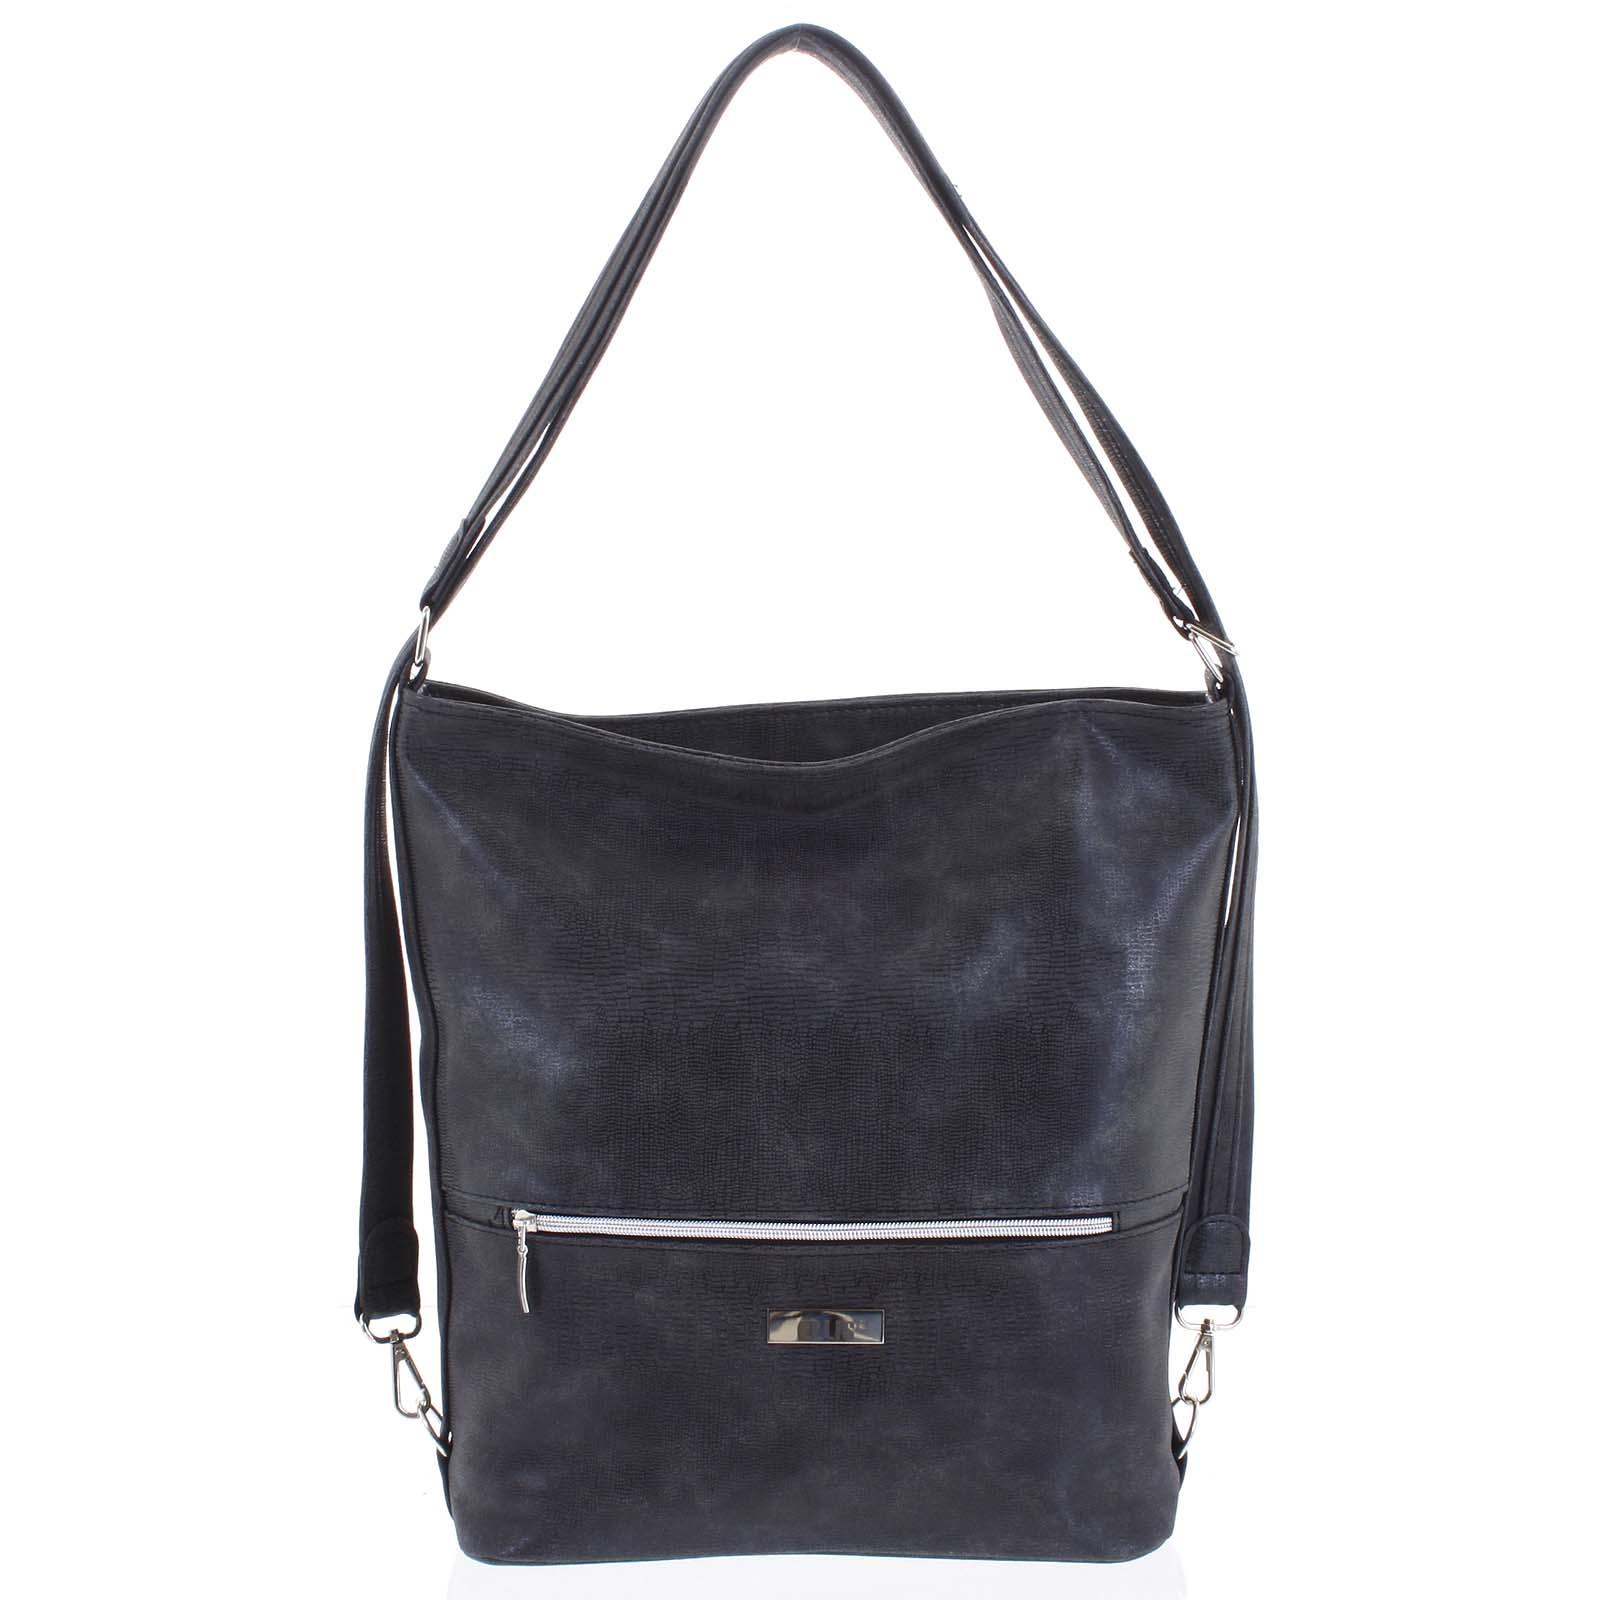 Módna dámska kabelka batoh tmavo šedá so vzorom - Ellis Patrik